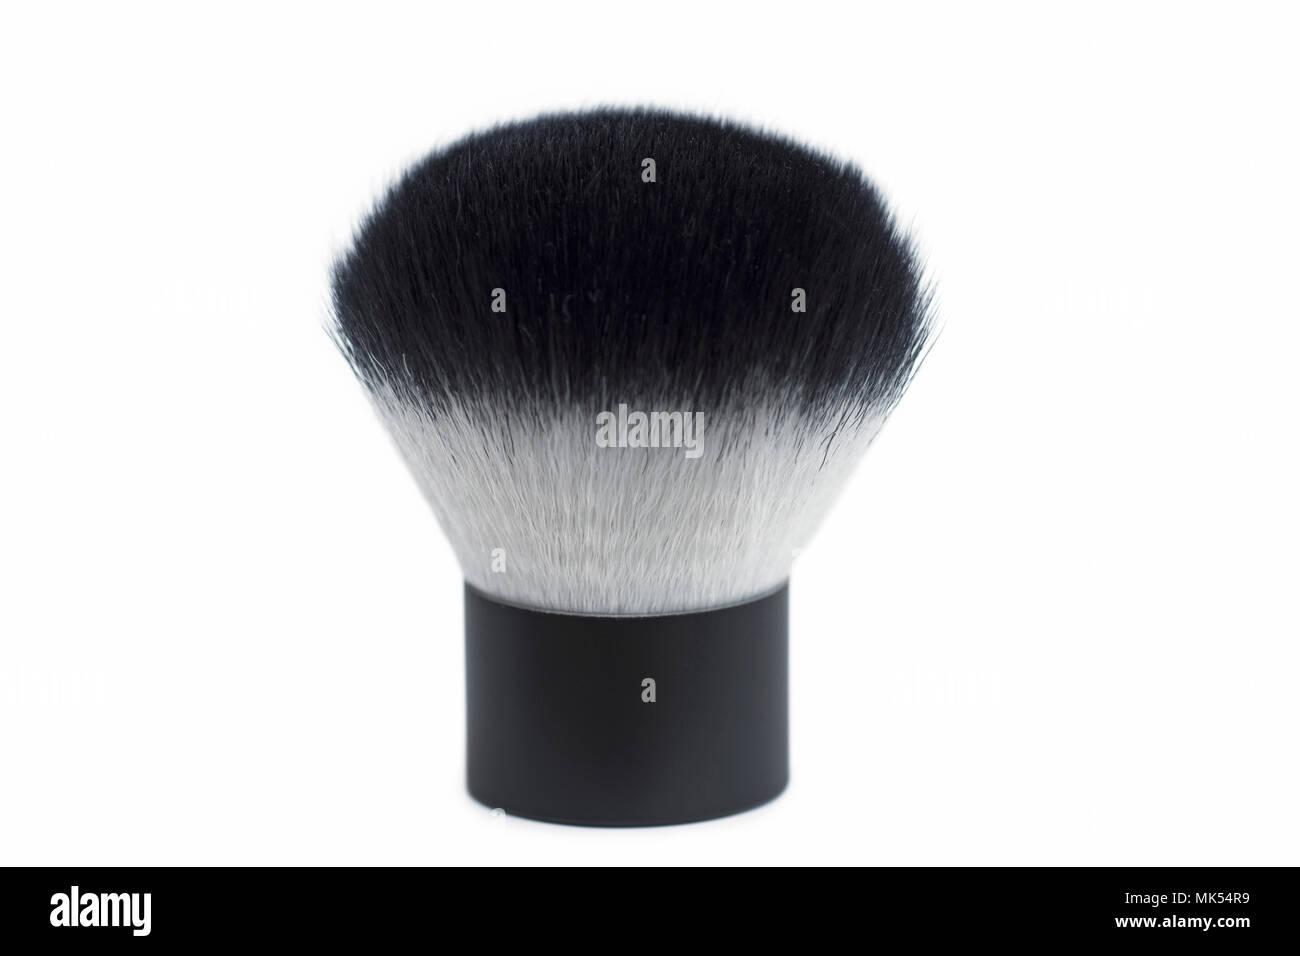 Kabuki Brush, Cosmetics, Powder, Makeup - Stock Image